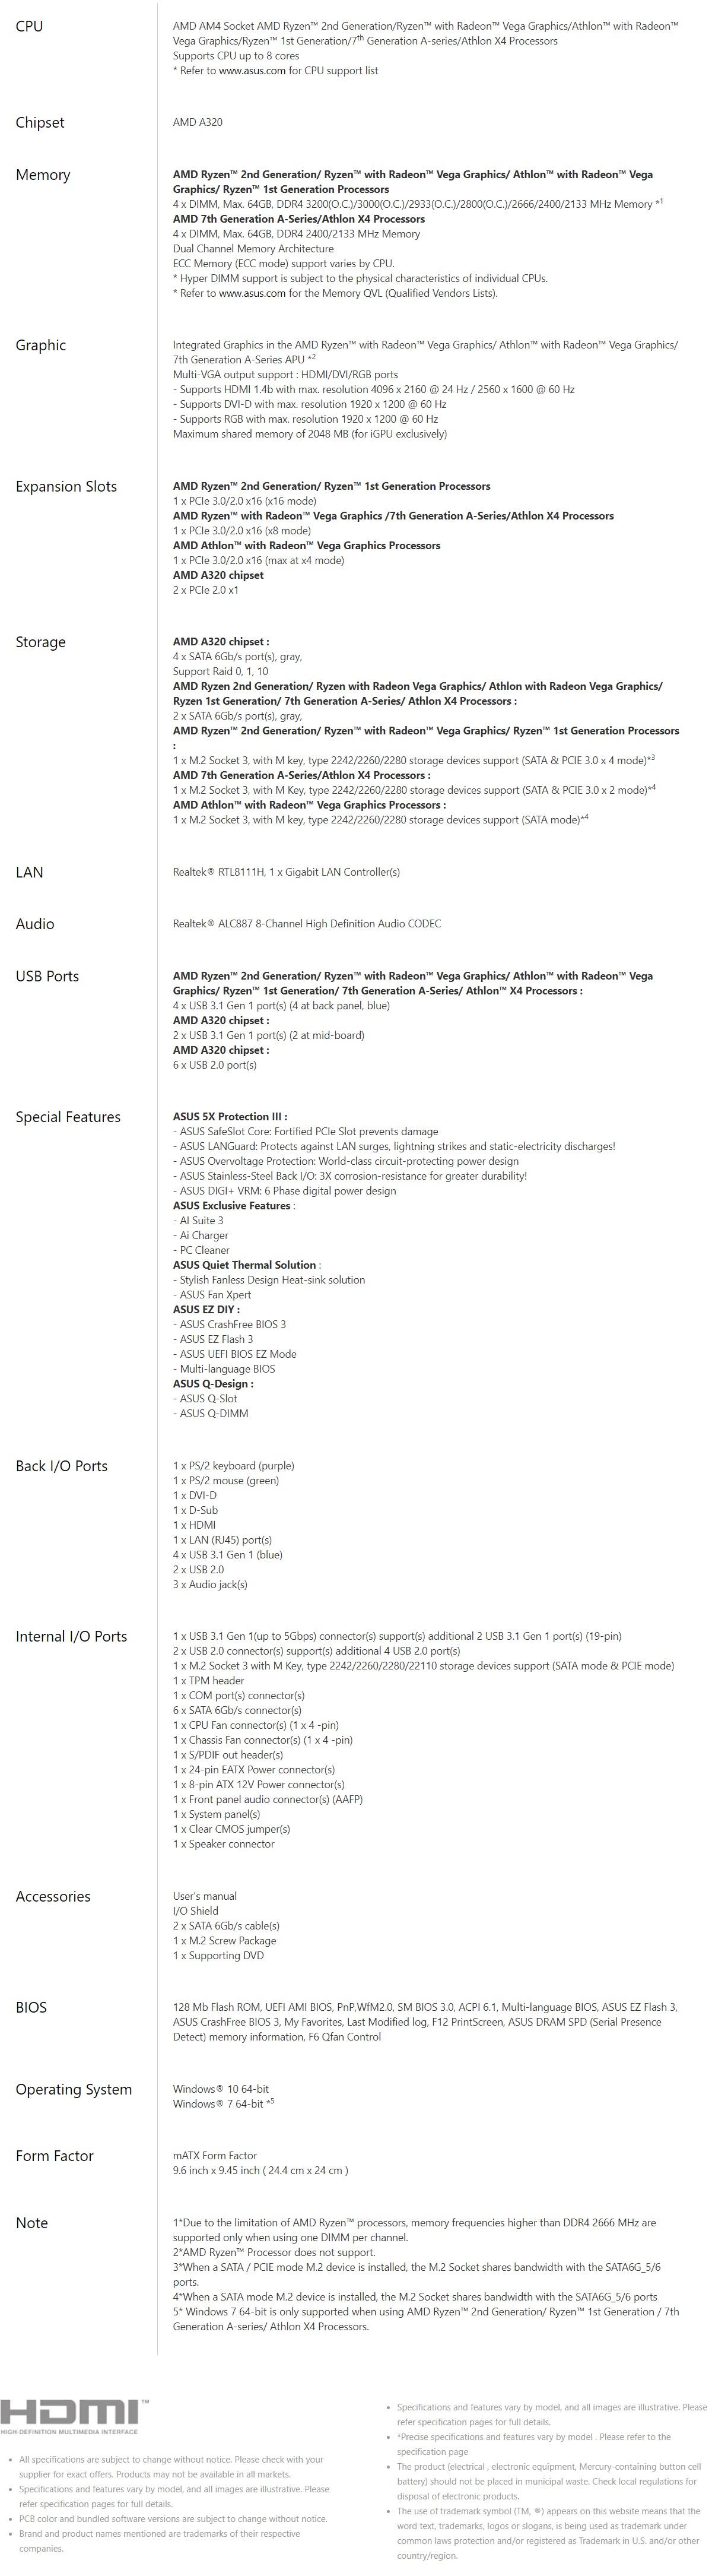 Asus PRIME A320M-A/CSM MATX Gaming Motherboard